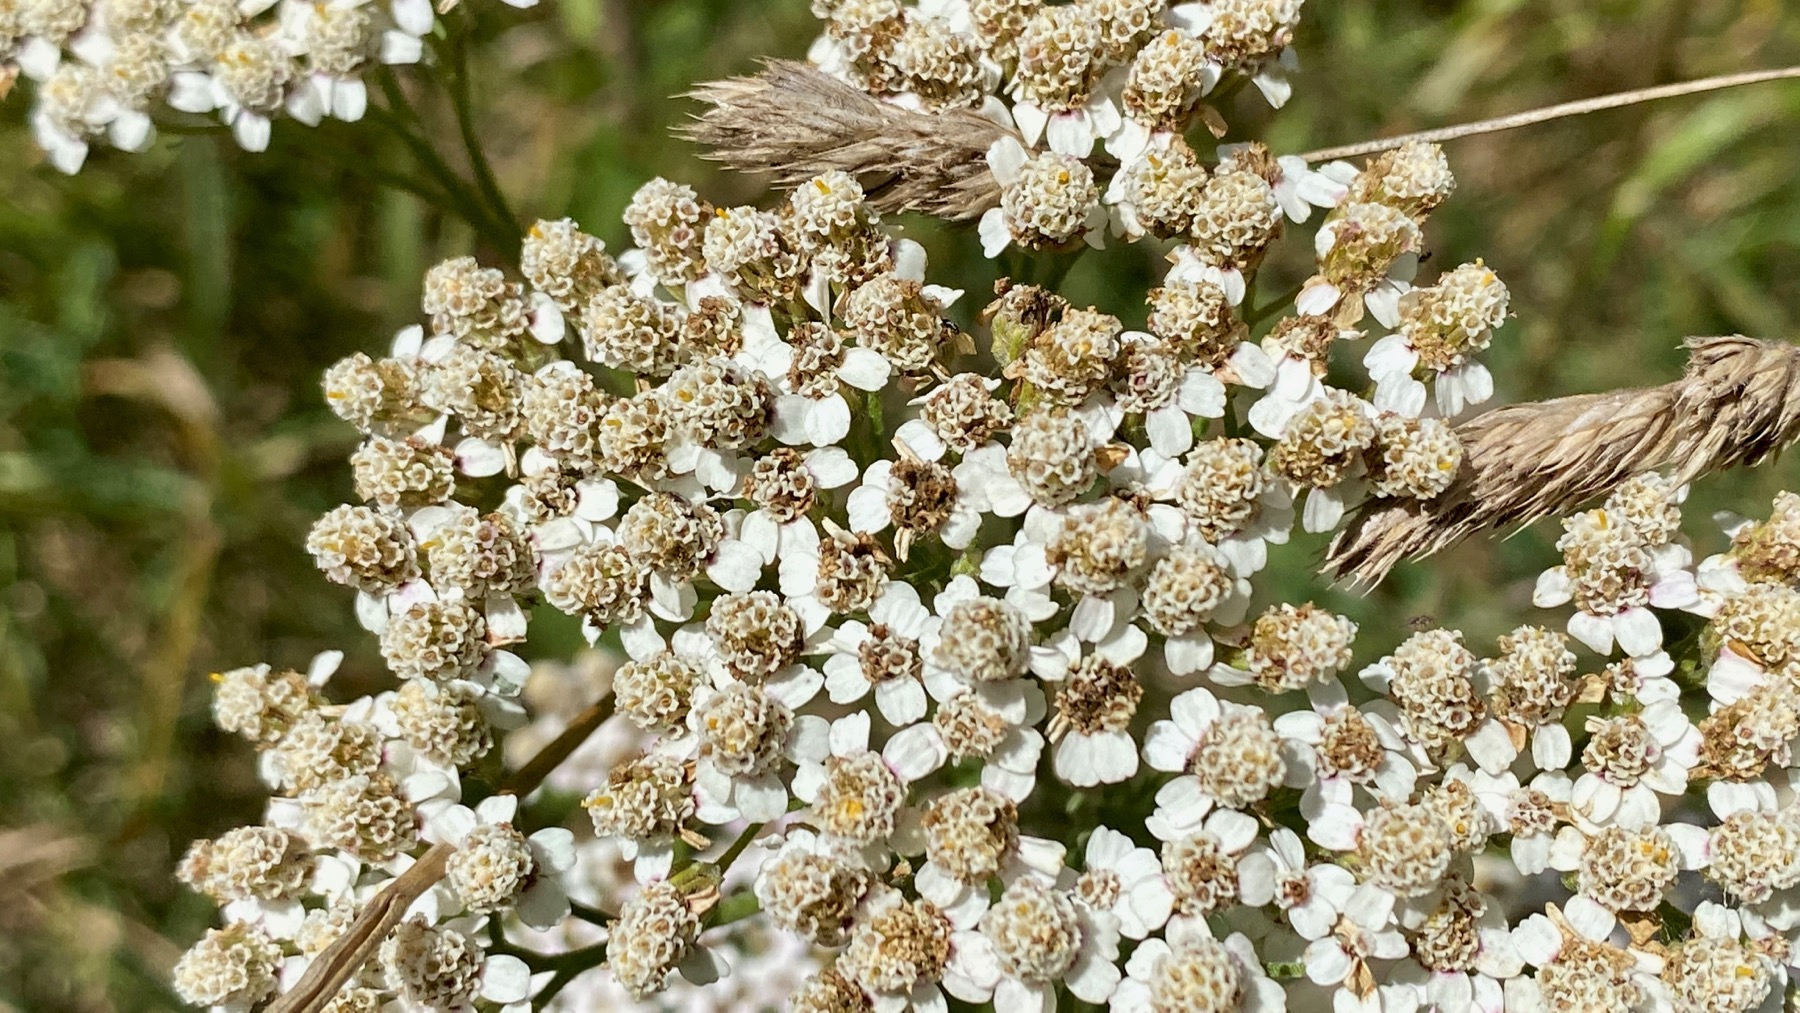 Flower capture